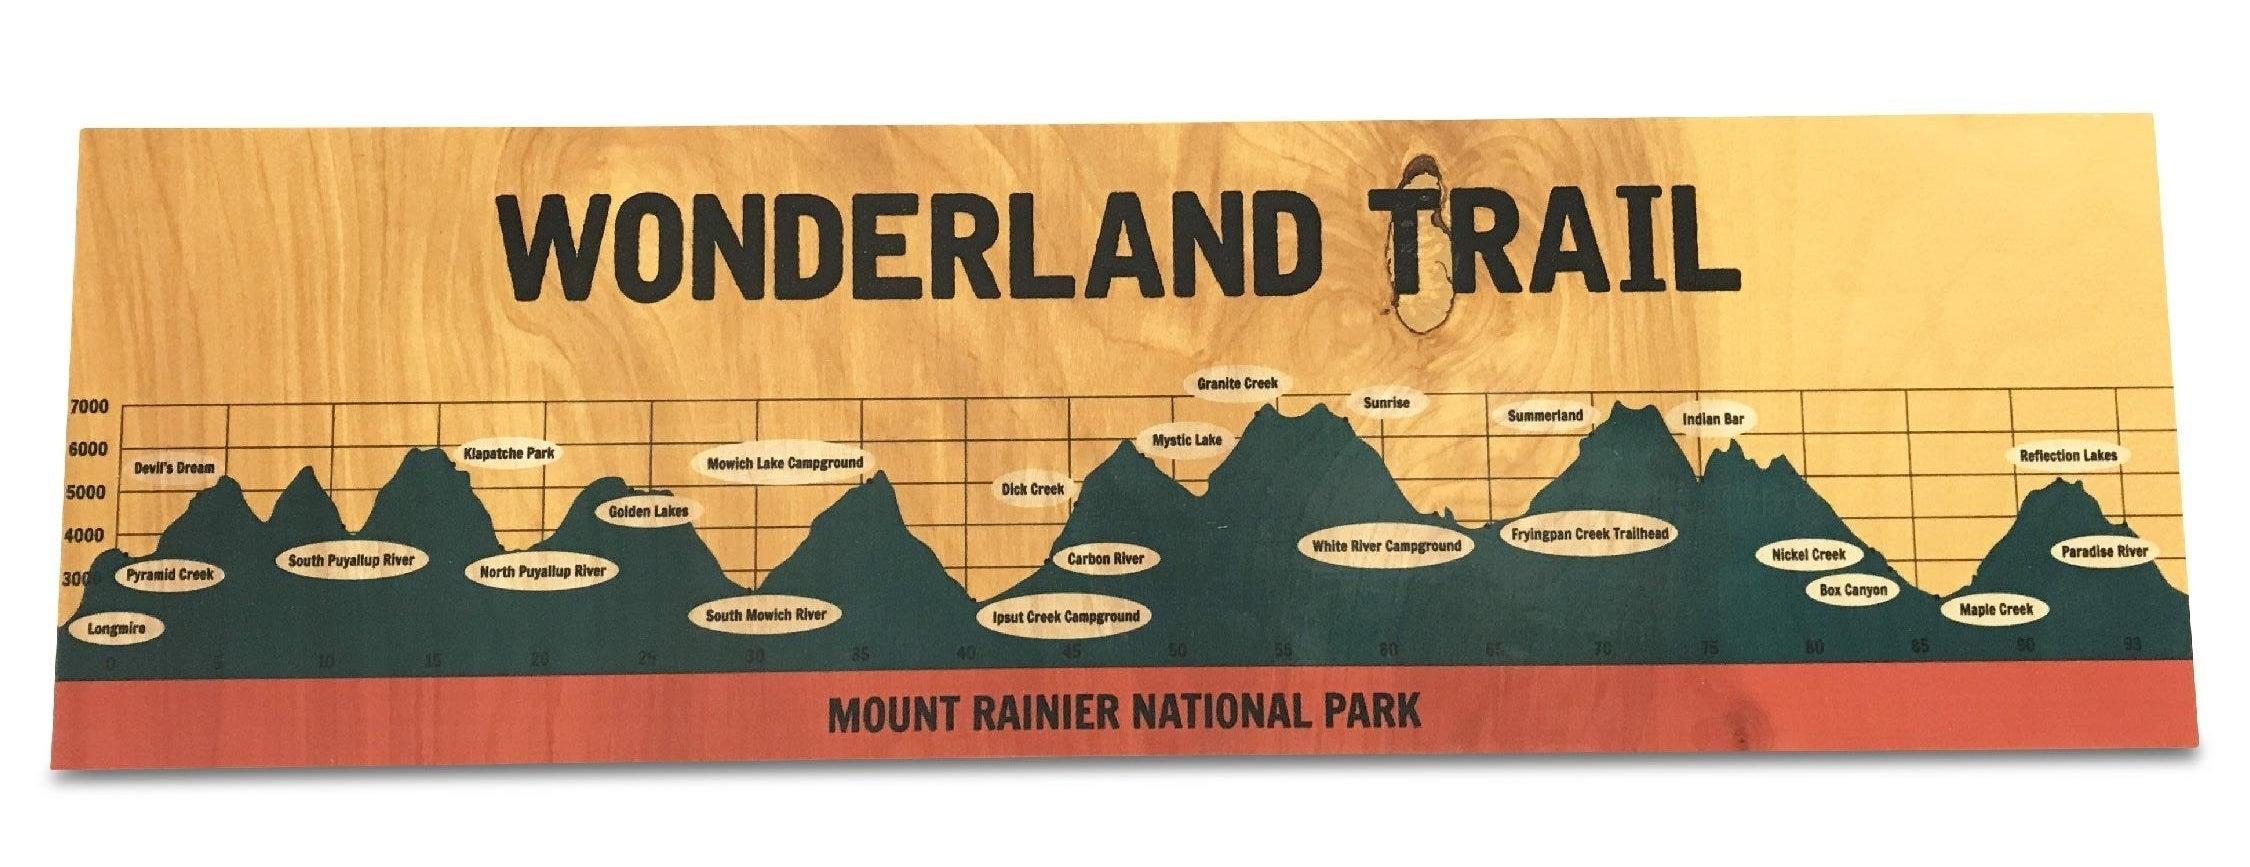 Wonderland trail wall sign